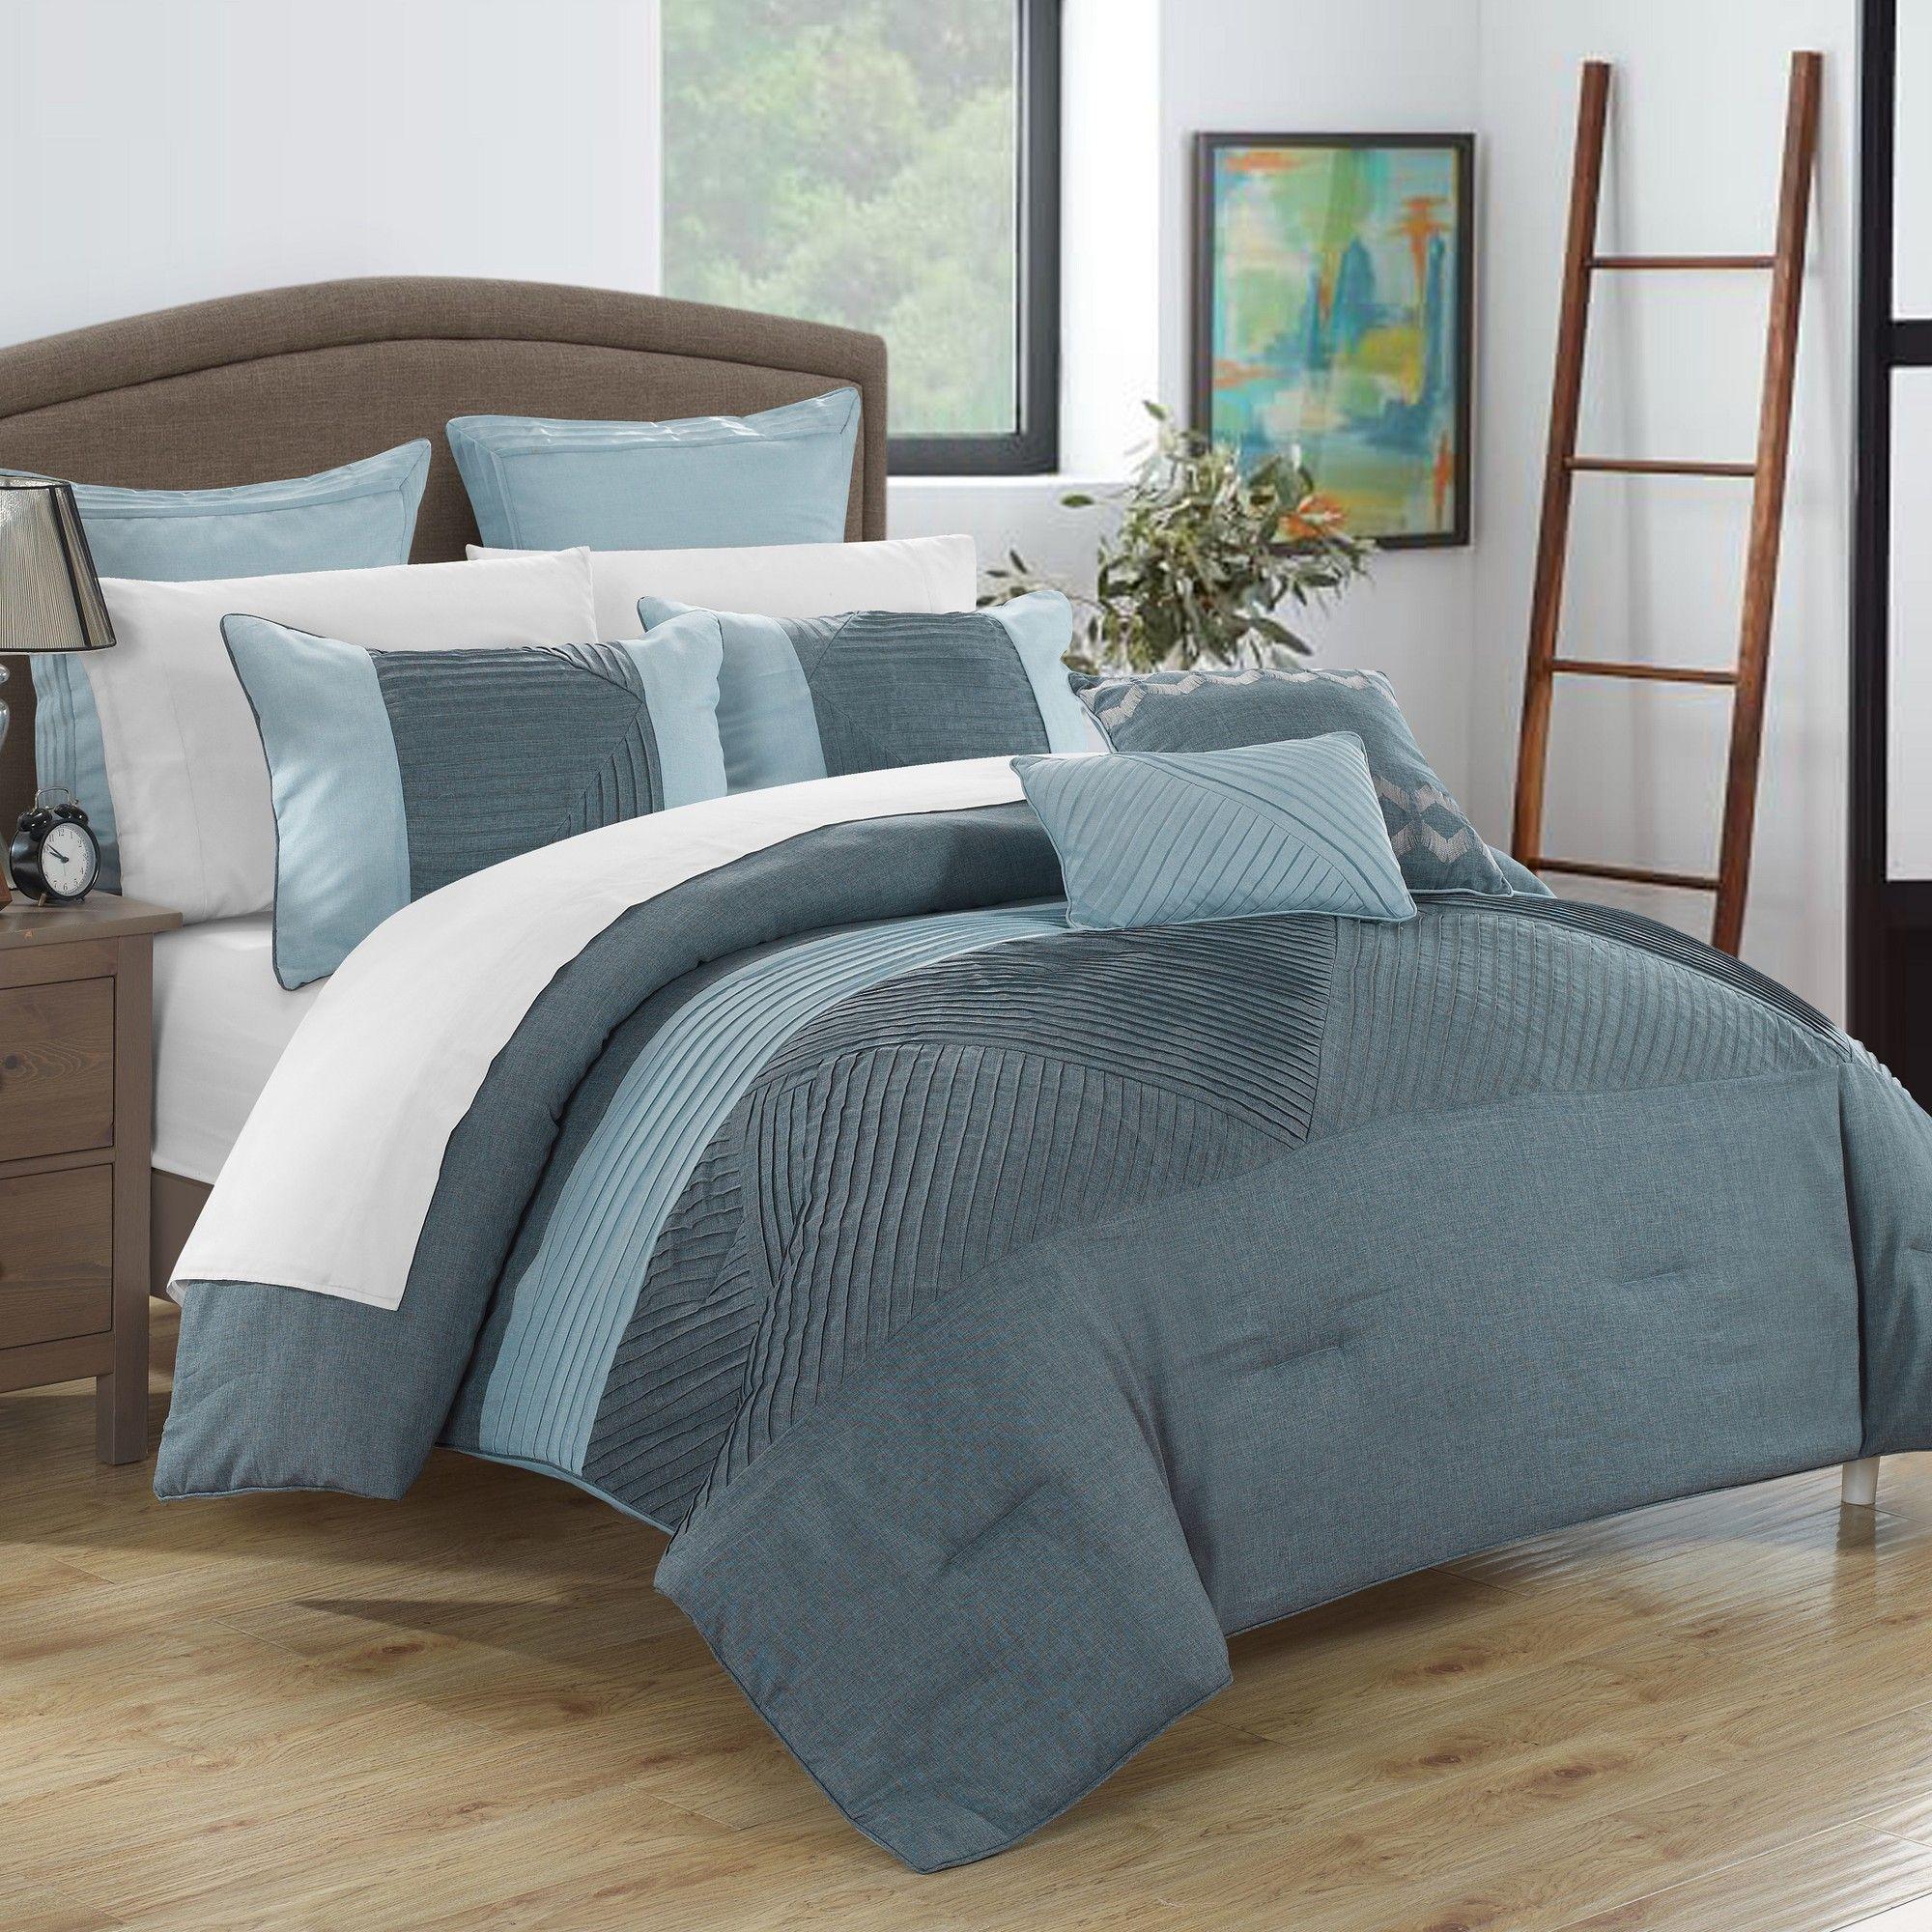 Marbella 11 Piece Comforter Set